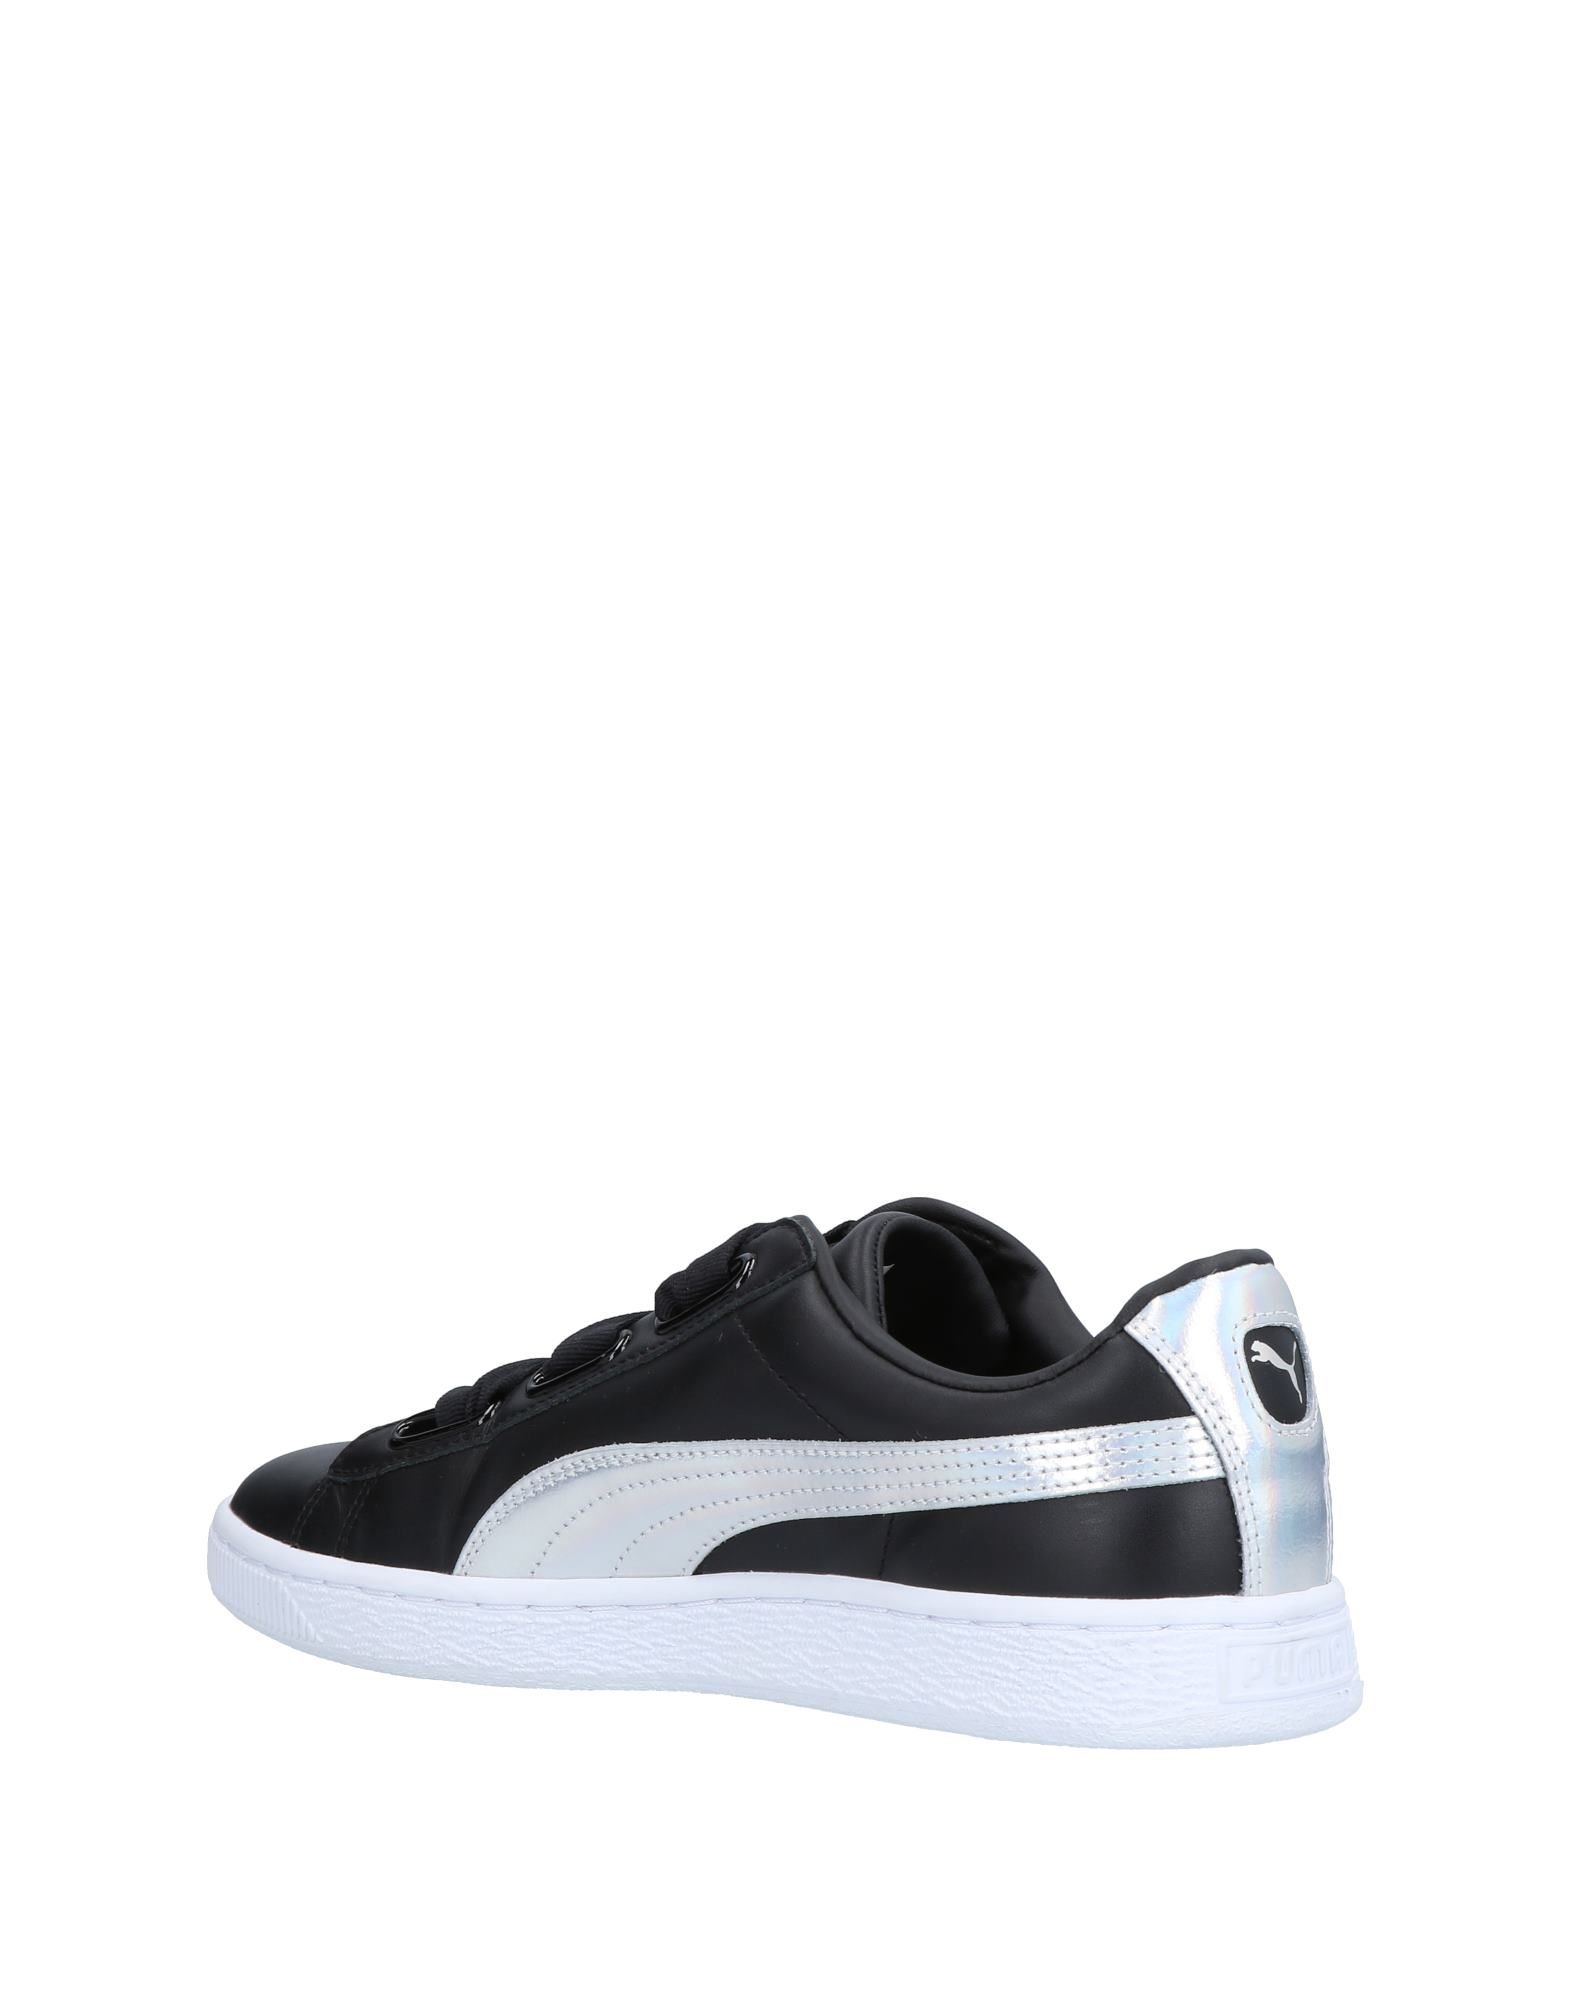 Puma 11505579TG Sneakers Damen  11505579TG Puma Gute Qualität beliebte Schuhe a7b283